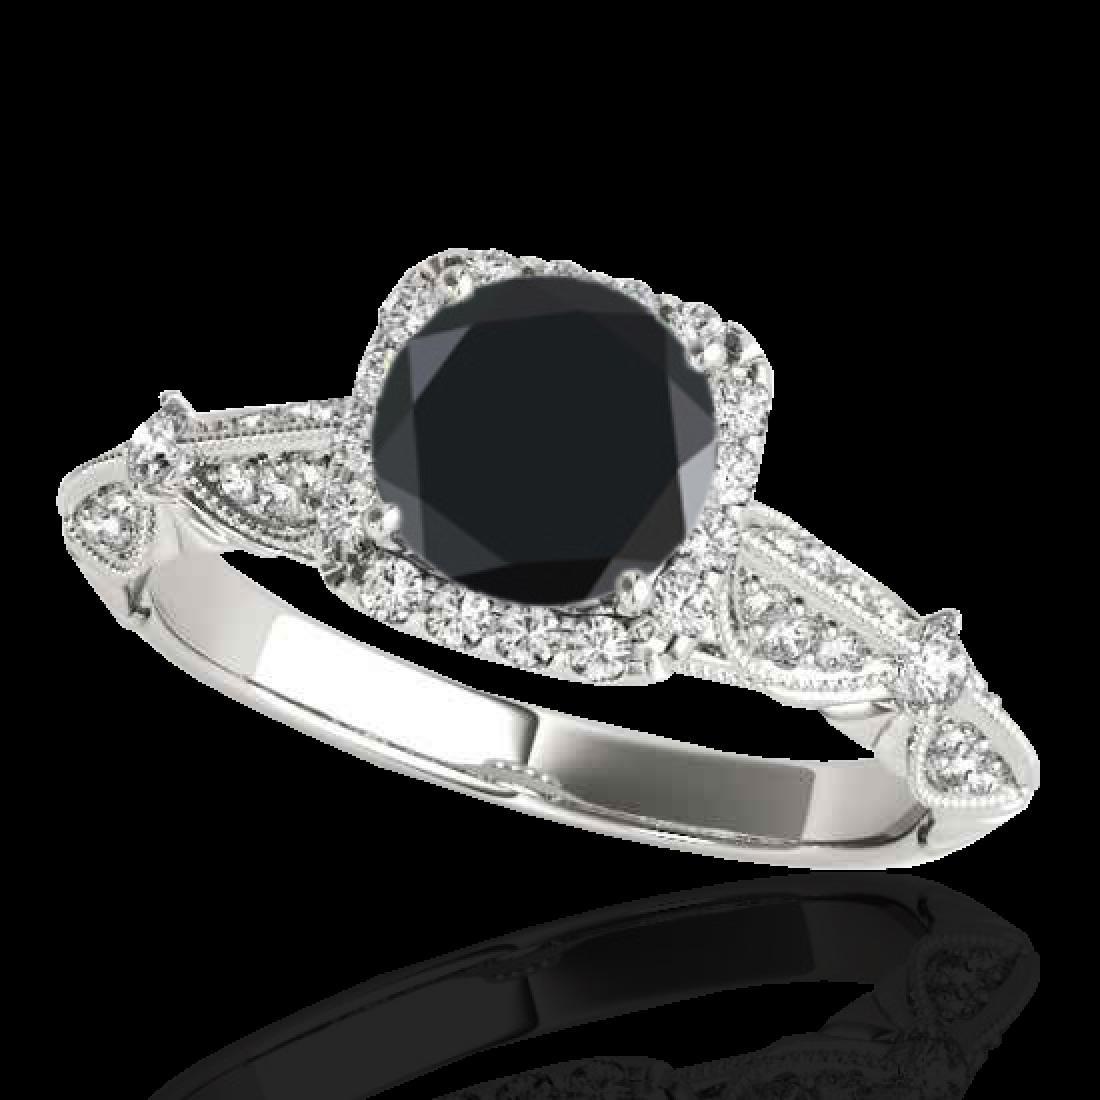 1.36 CTW Certified VS Black Diamond Solitaire Halo Ring